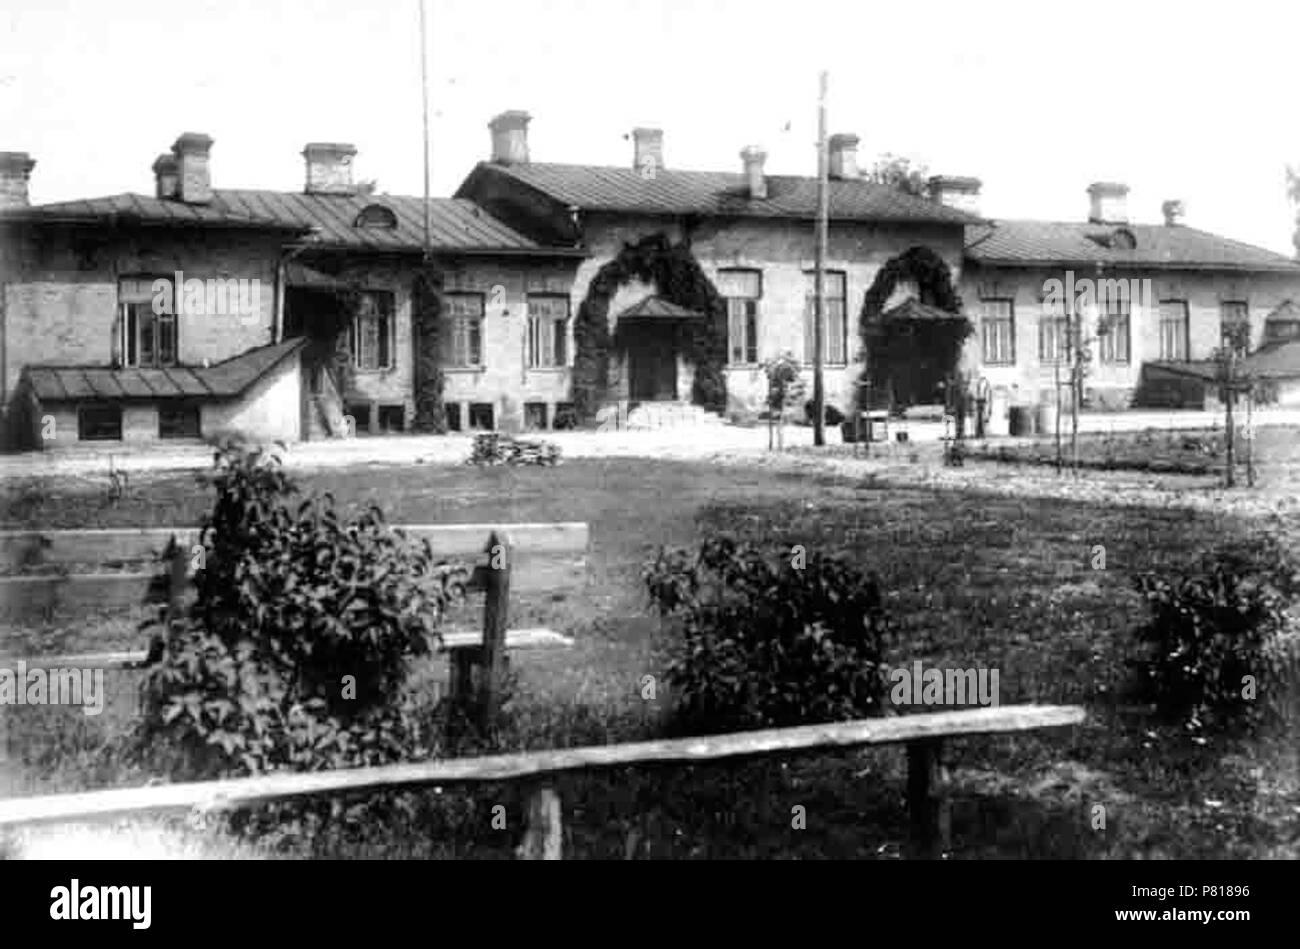 385 Vaŭkavysk, Vola. Ваўкавыск, Воля (1919-39) (2) - Stock Image